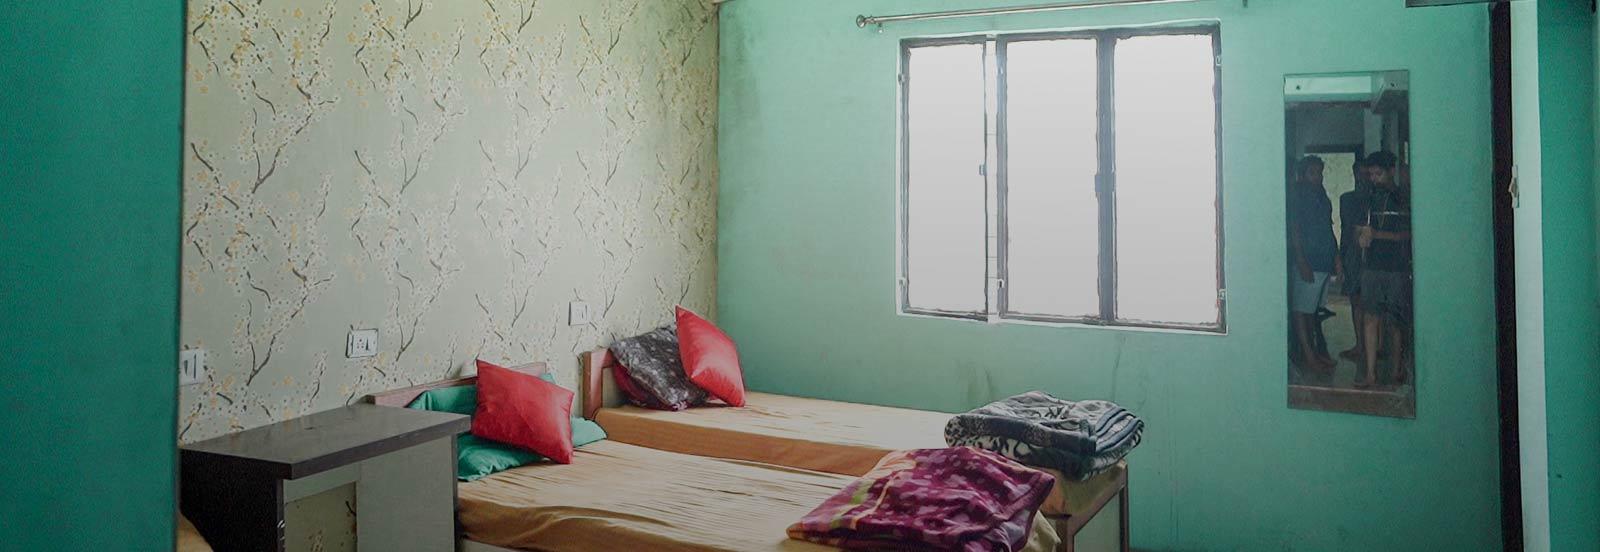 Frankswellness Centre in Ghaziabad